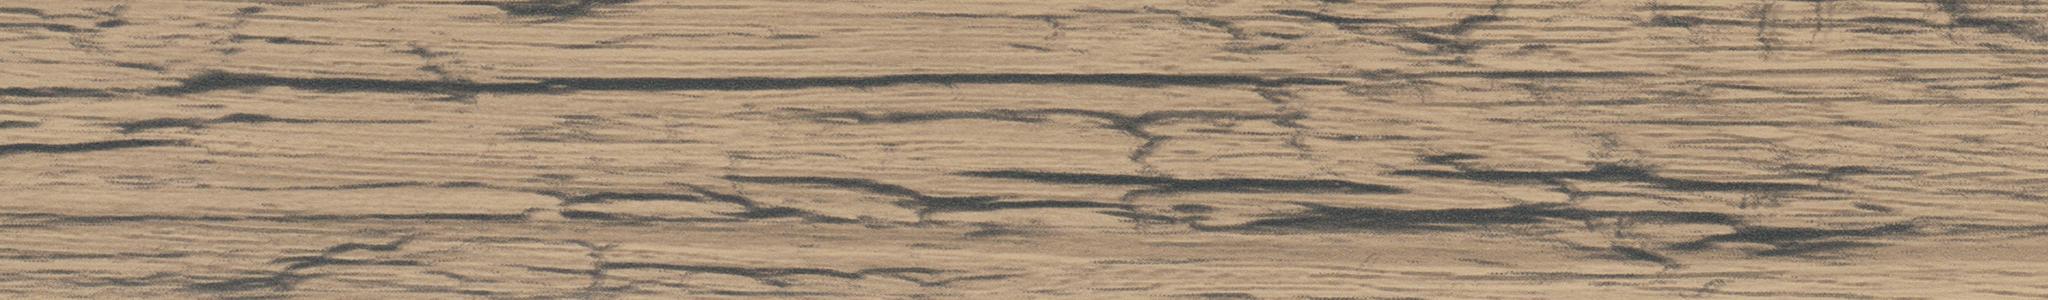 HD 258784 ABS Kante Dekor Schwarz Limba perl